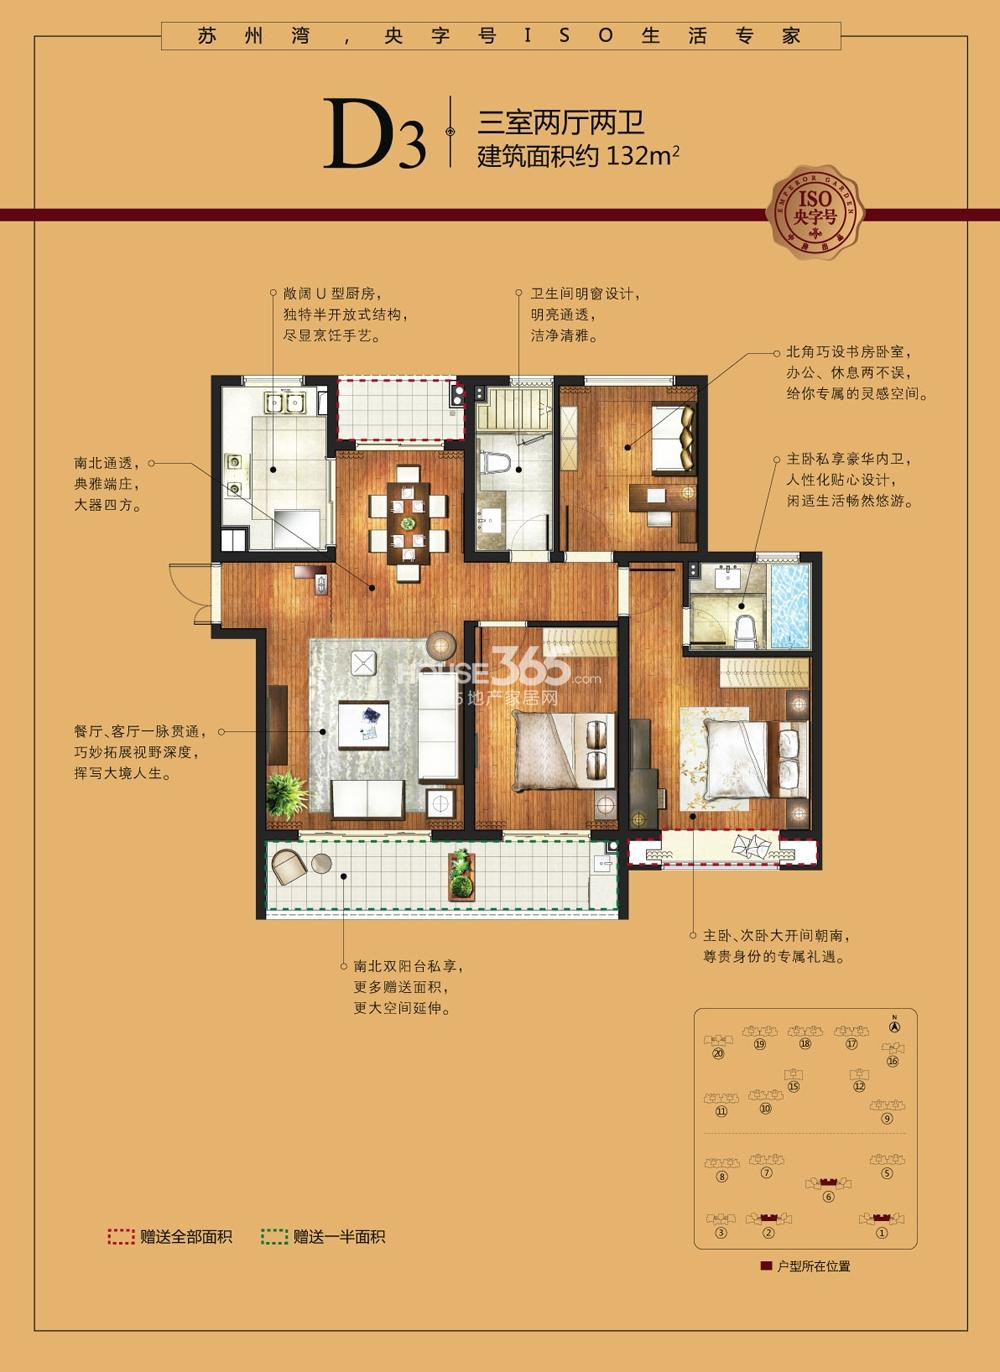 D3户型132平米,三室两厅两卫